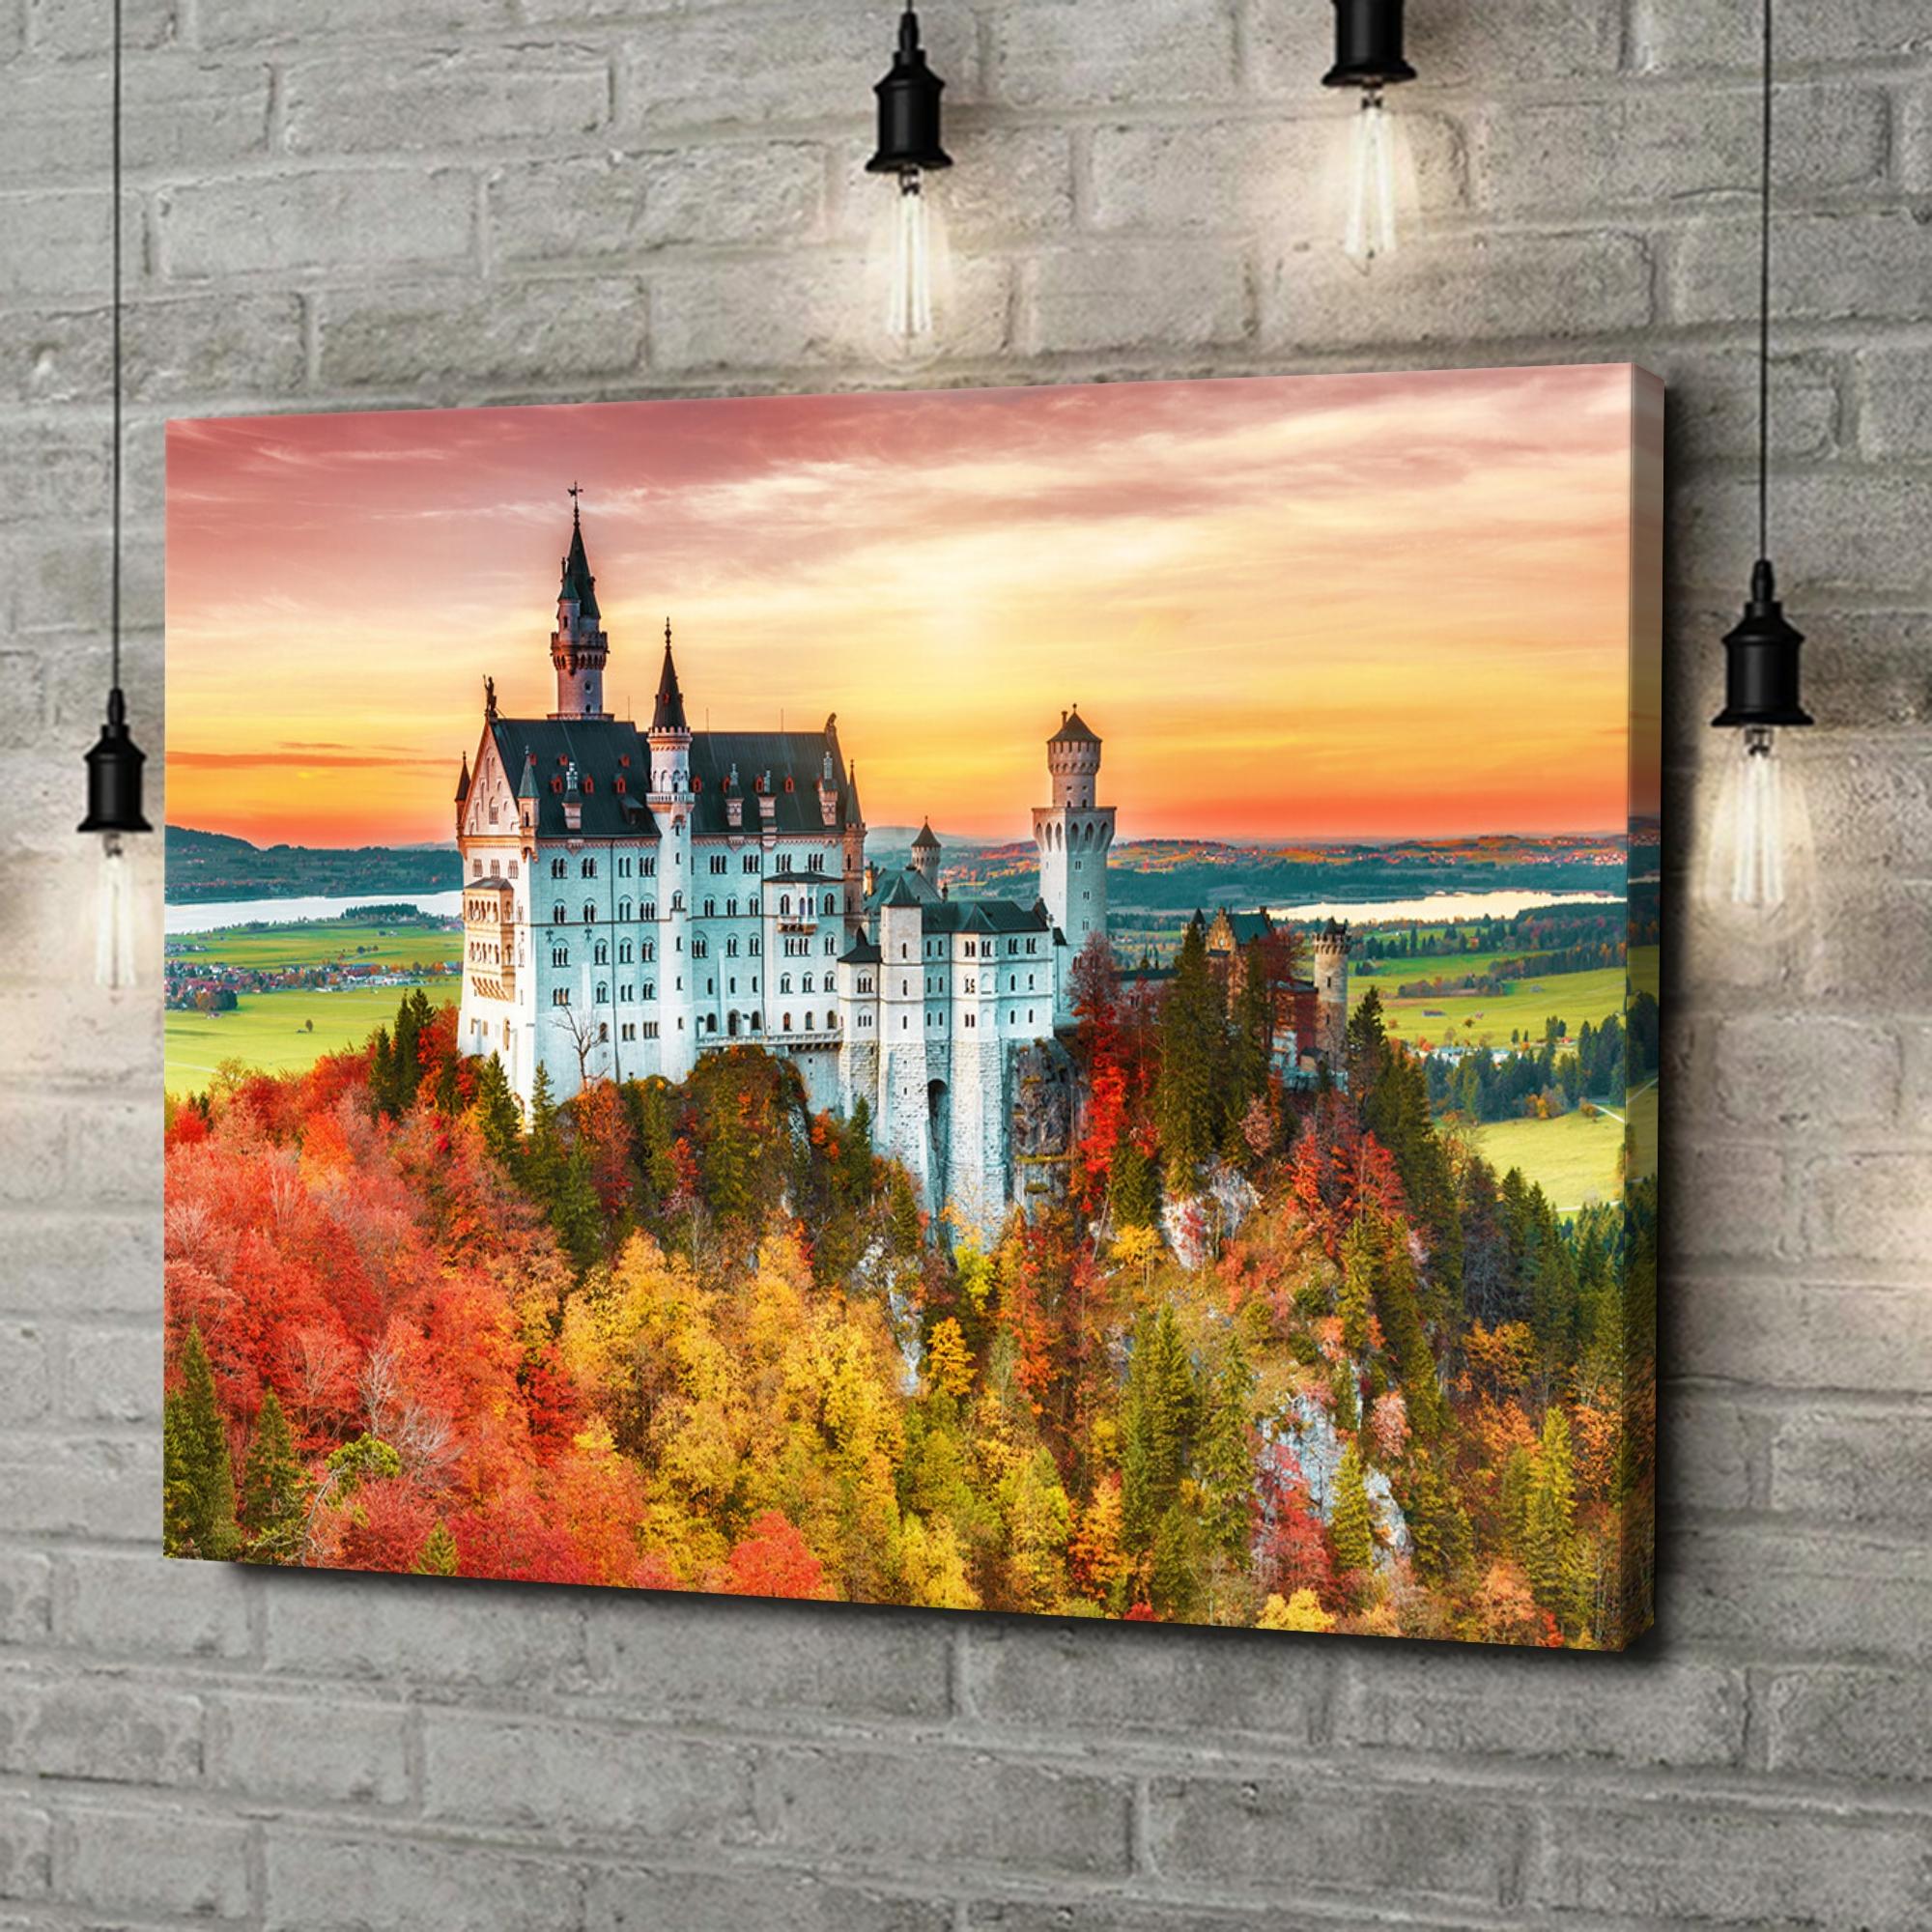 Leinwandbild personalisiert Schloss Neuschwanstein